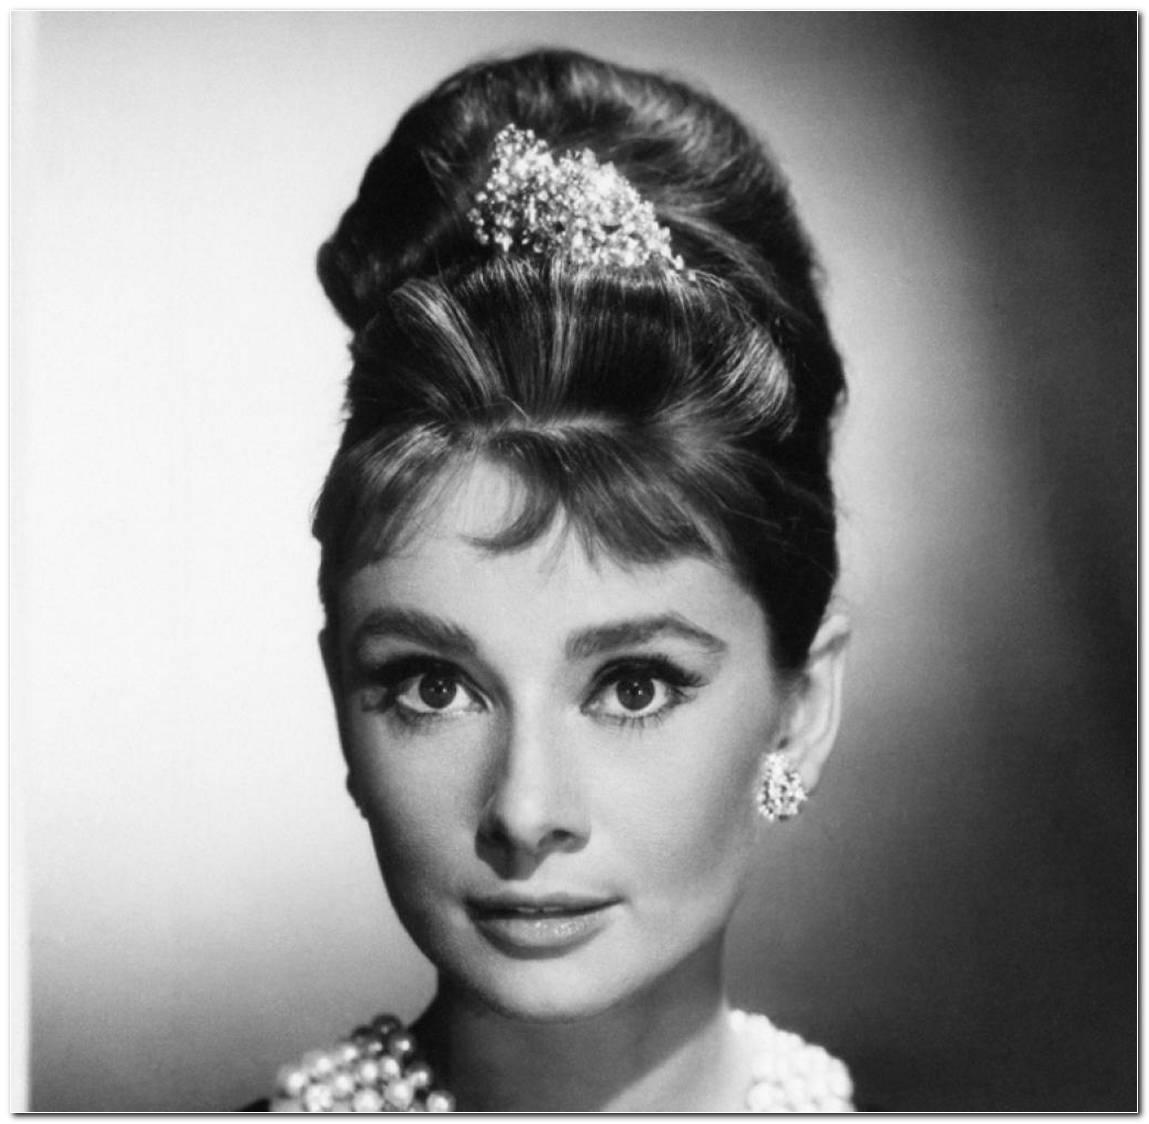 Audrey Hepburn Frisur FrüHstüCk Bei Tiffany